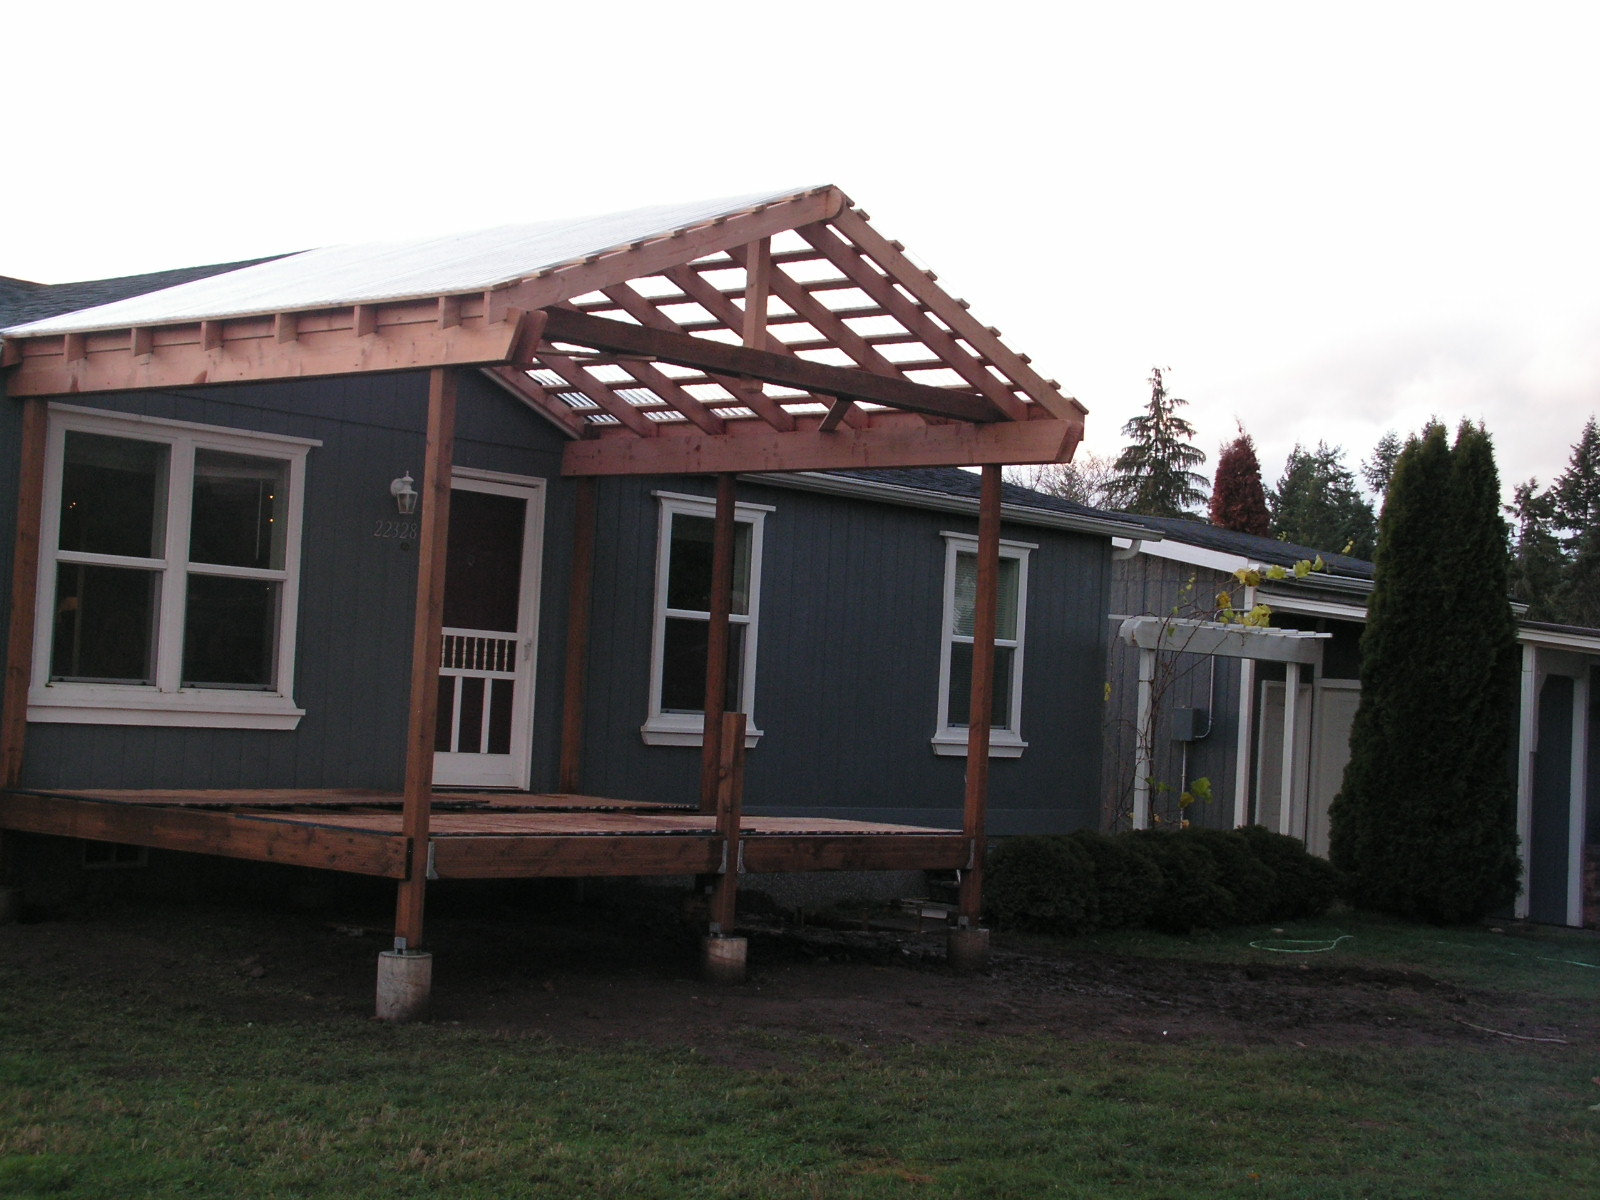 Raised Ranch Front Porch Design Joy Studio Design Front Porch Ideas Style For Ranch Home